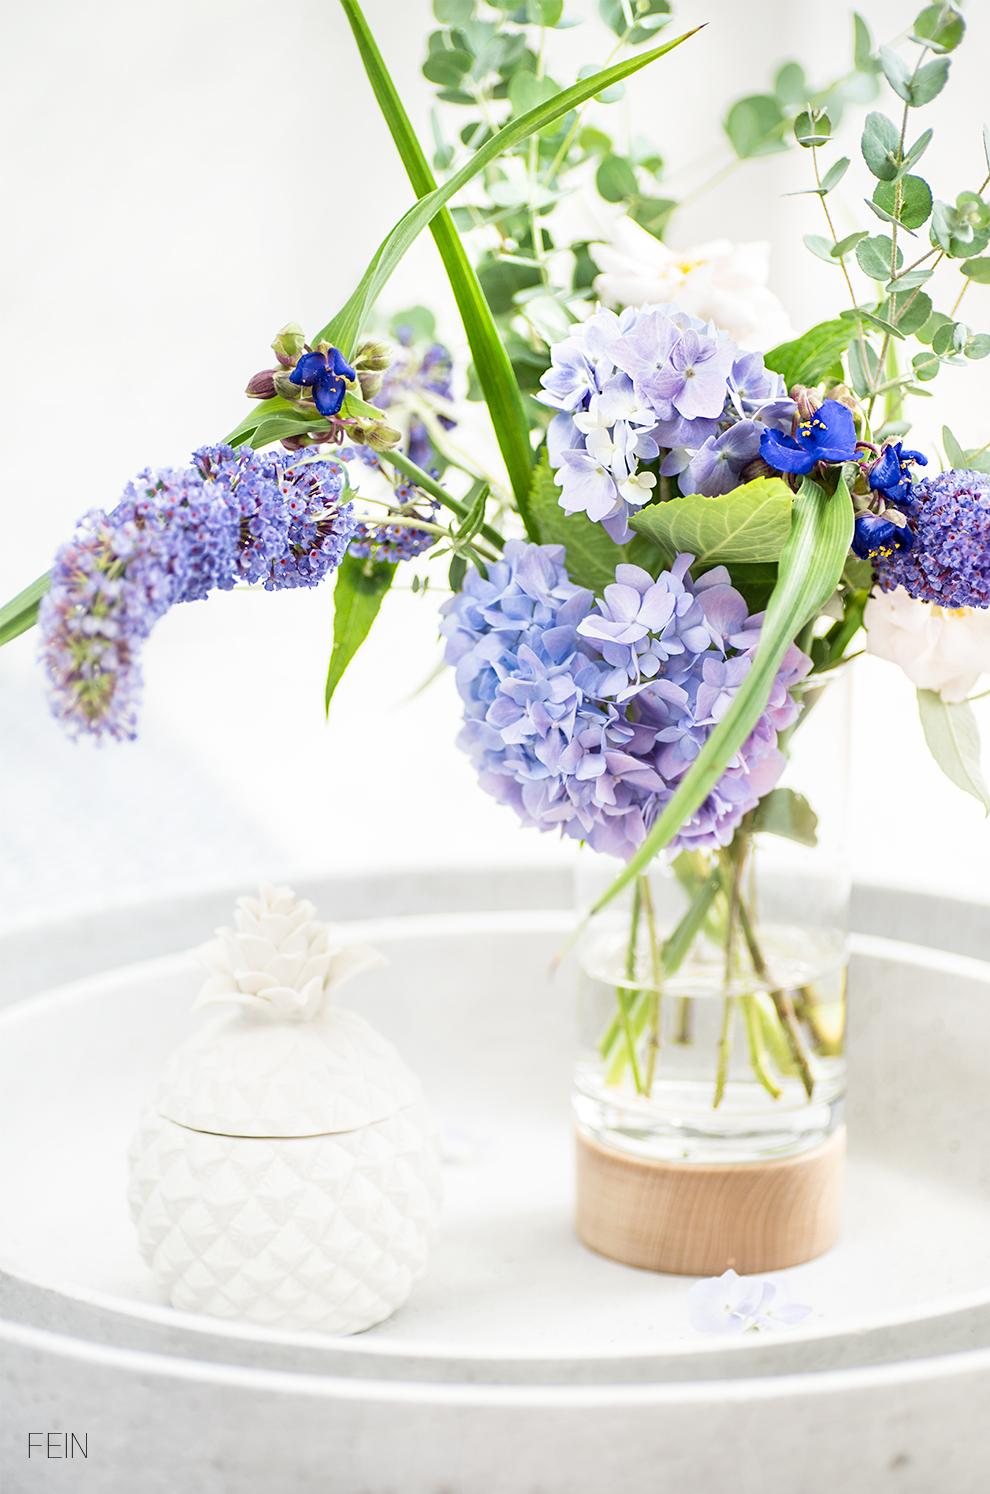 Outdoor Blumen Sommerflieder Hortensien